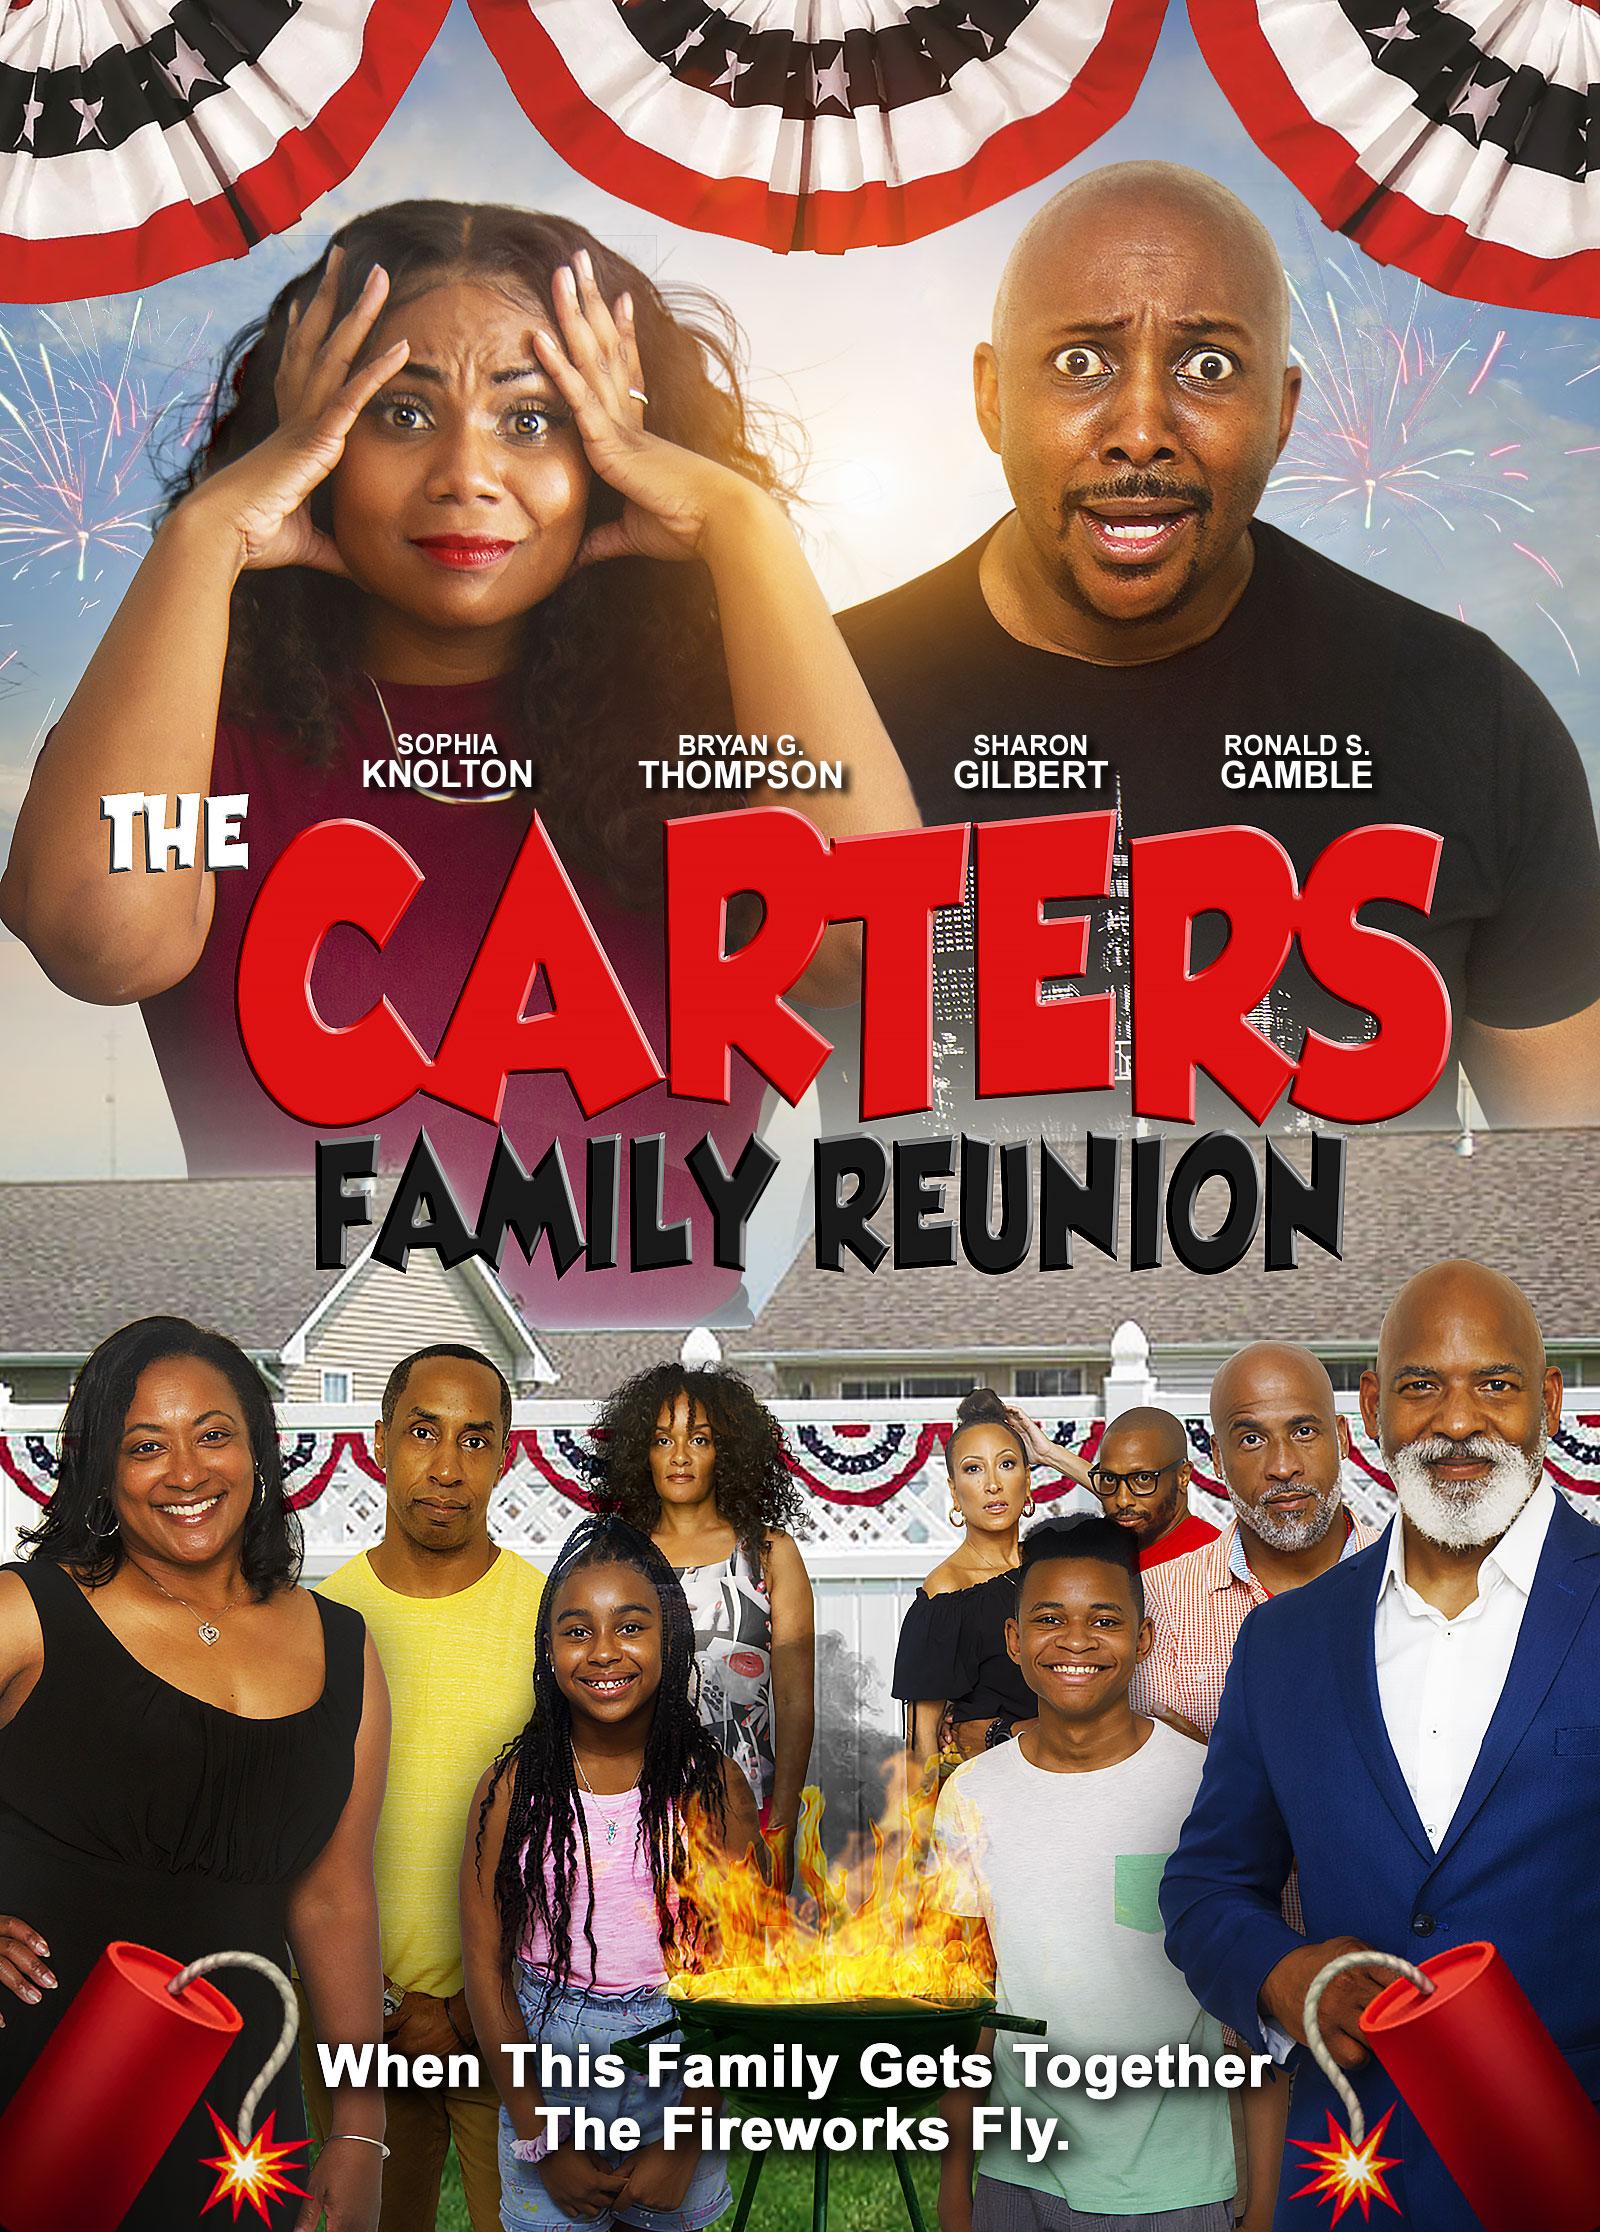 CARTER FAMILY REUNION